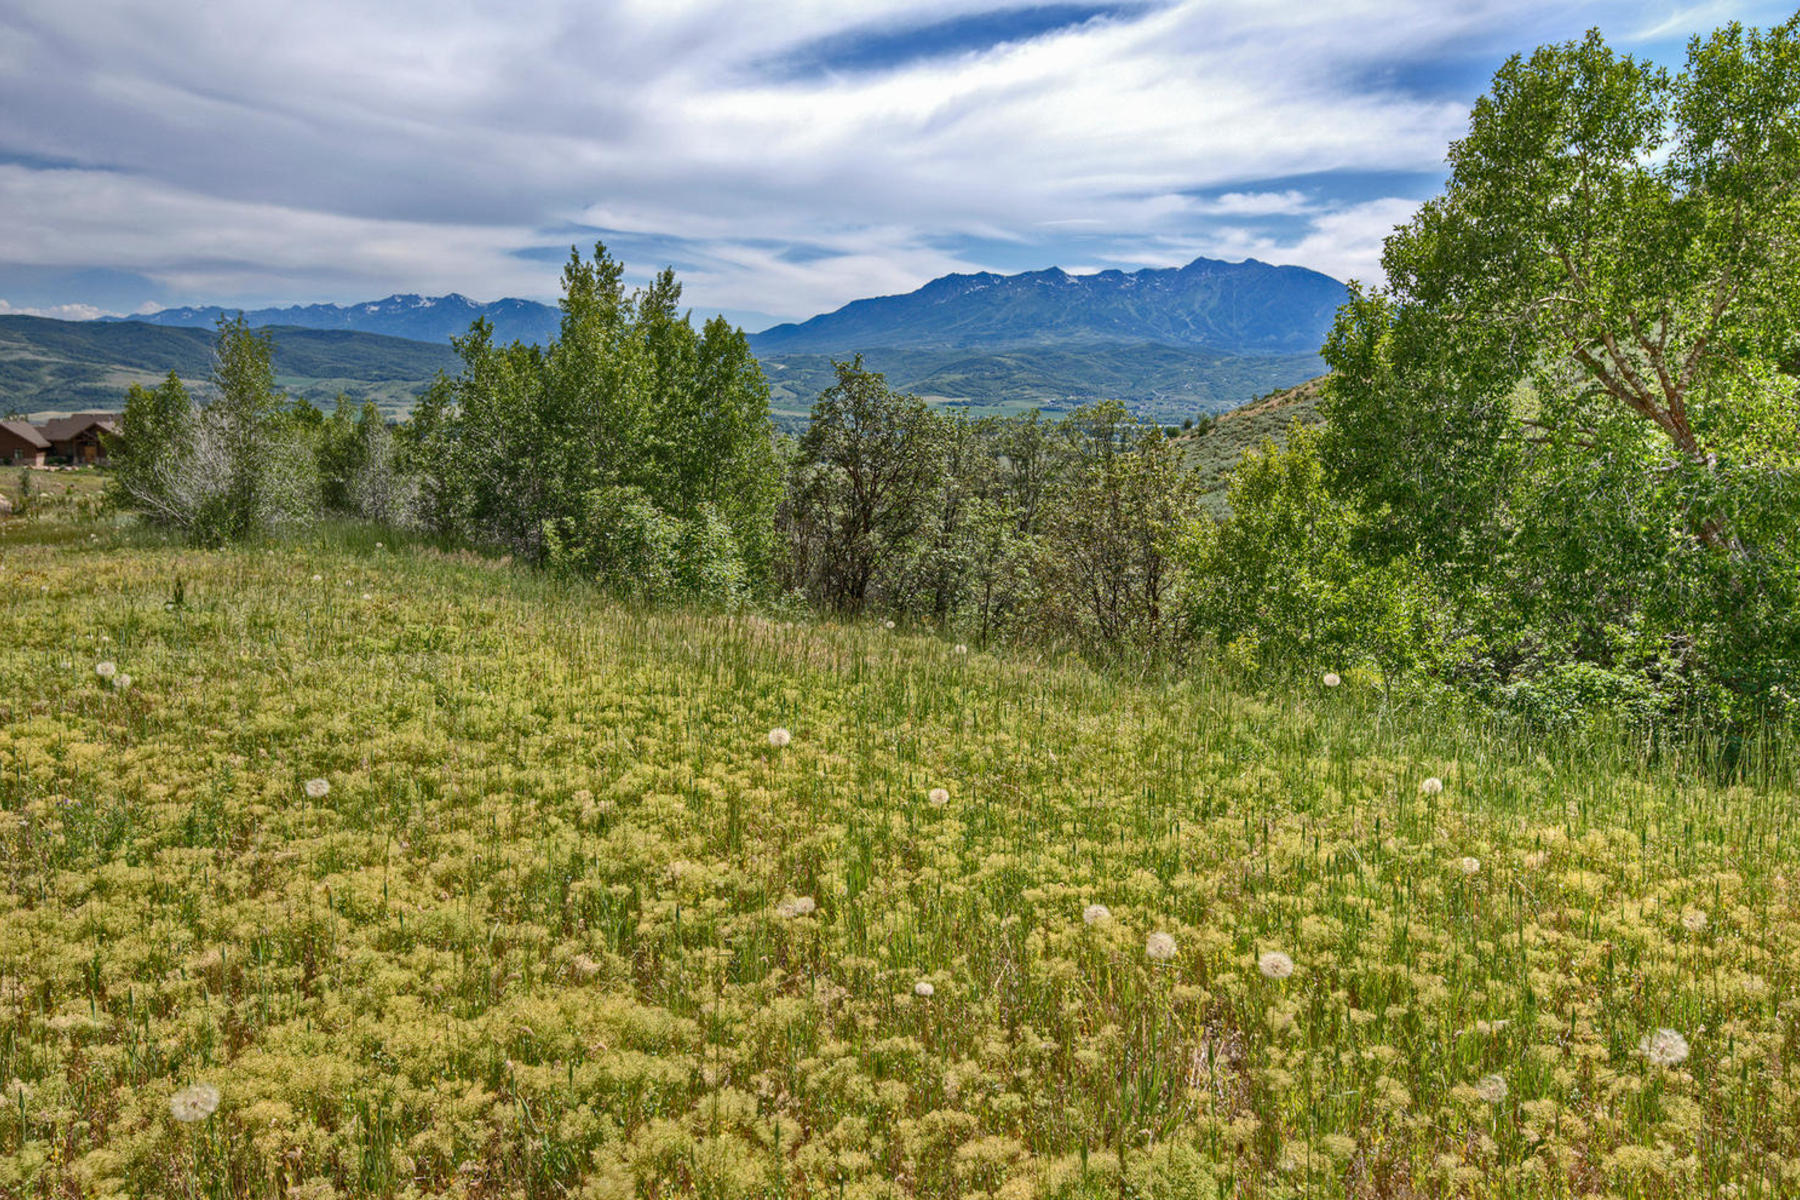 Земля для того Продажа на Home site boasts incredible views of Snowbasin Ski Resort & Pineview Reservoir 1115 North Maple Dr Huntsville, Юта 84317 Соединенные Штаты